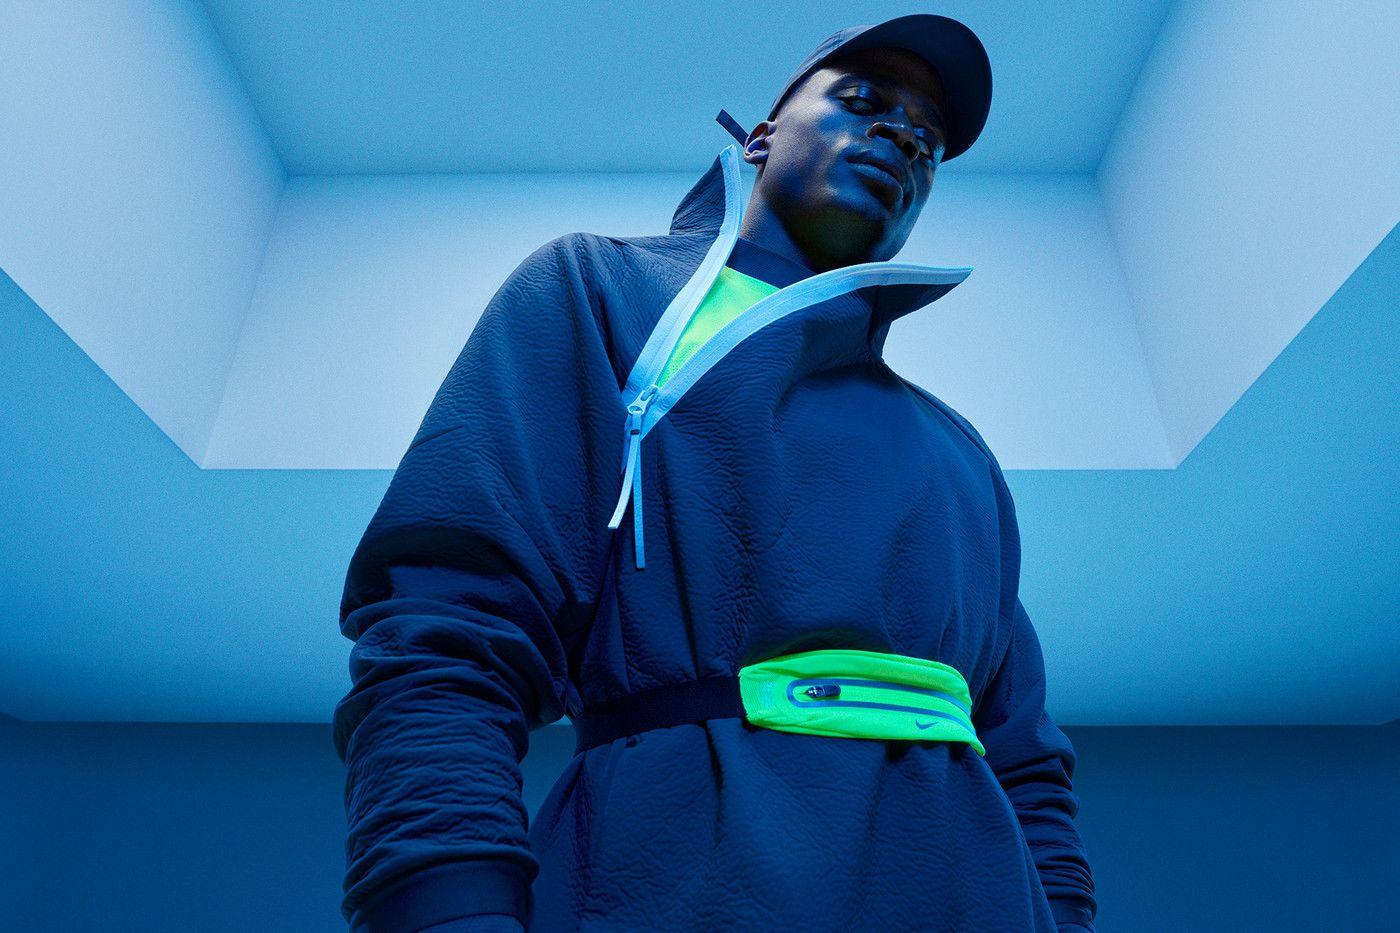 Inmunidad cáscara Miau miau  次世代韻動!Nike 2019 春季 Tech Pack 系列正式登場 | Tech pack ...